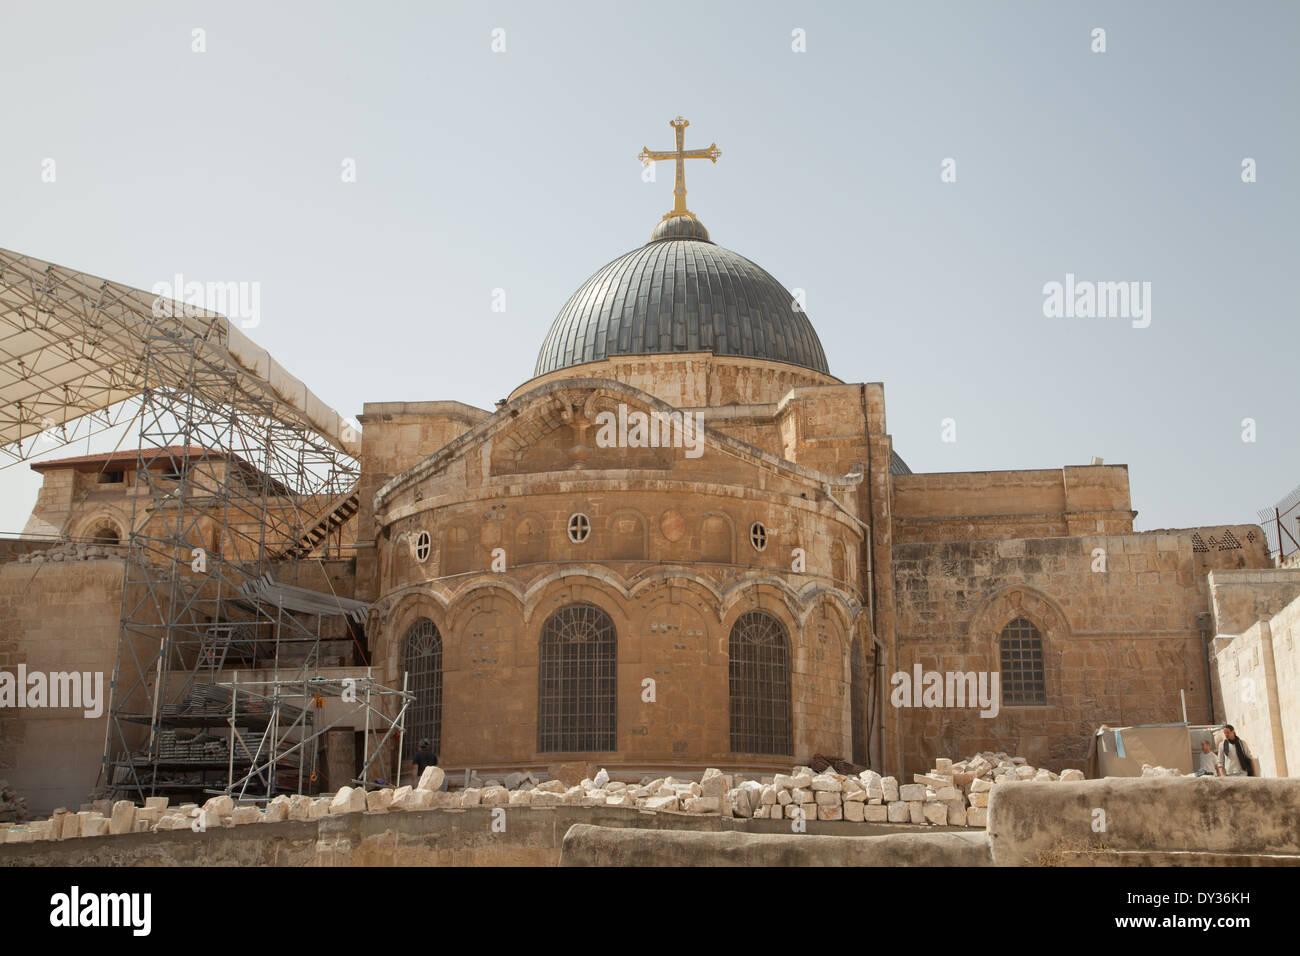 Church of the Holy Sepulchre, Jerusalem, Israel. Stock Photo